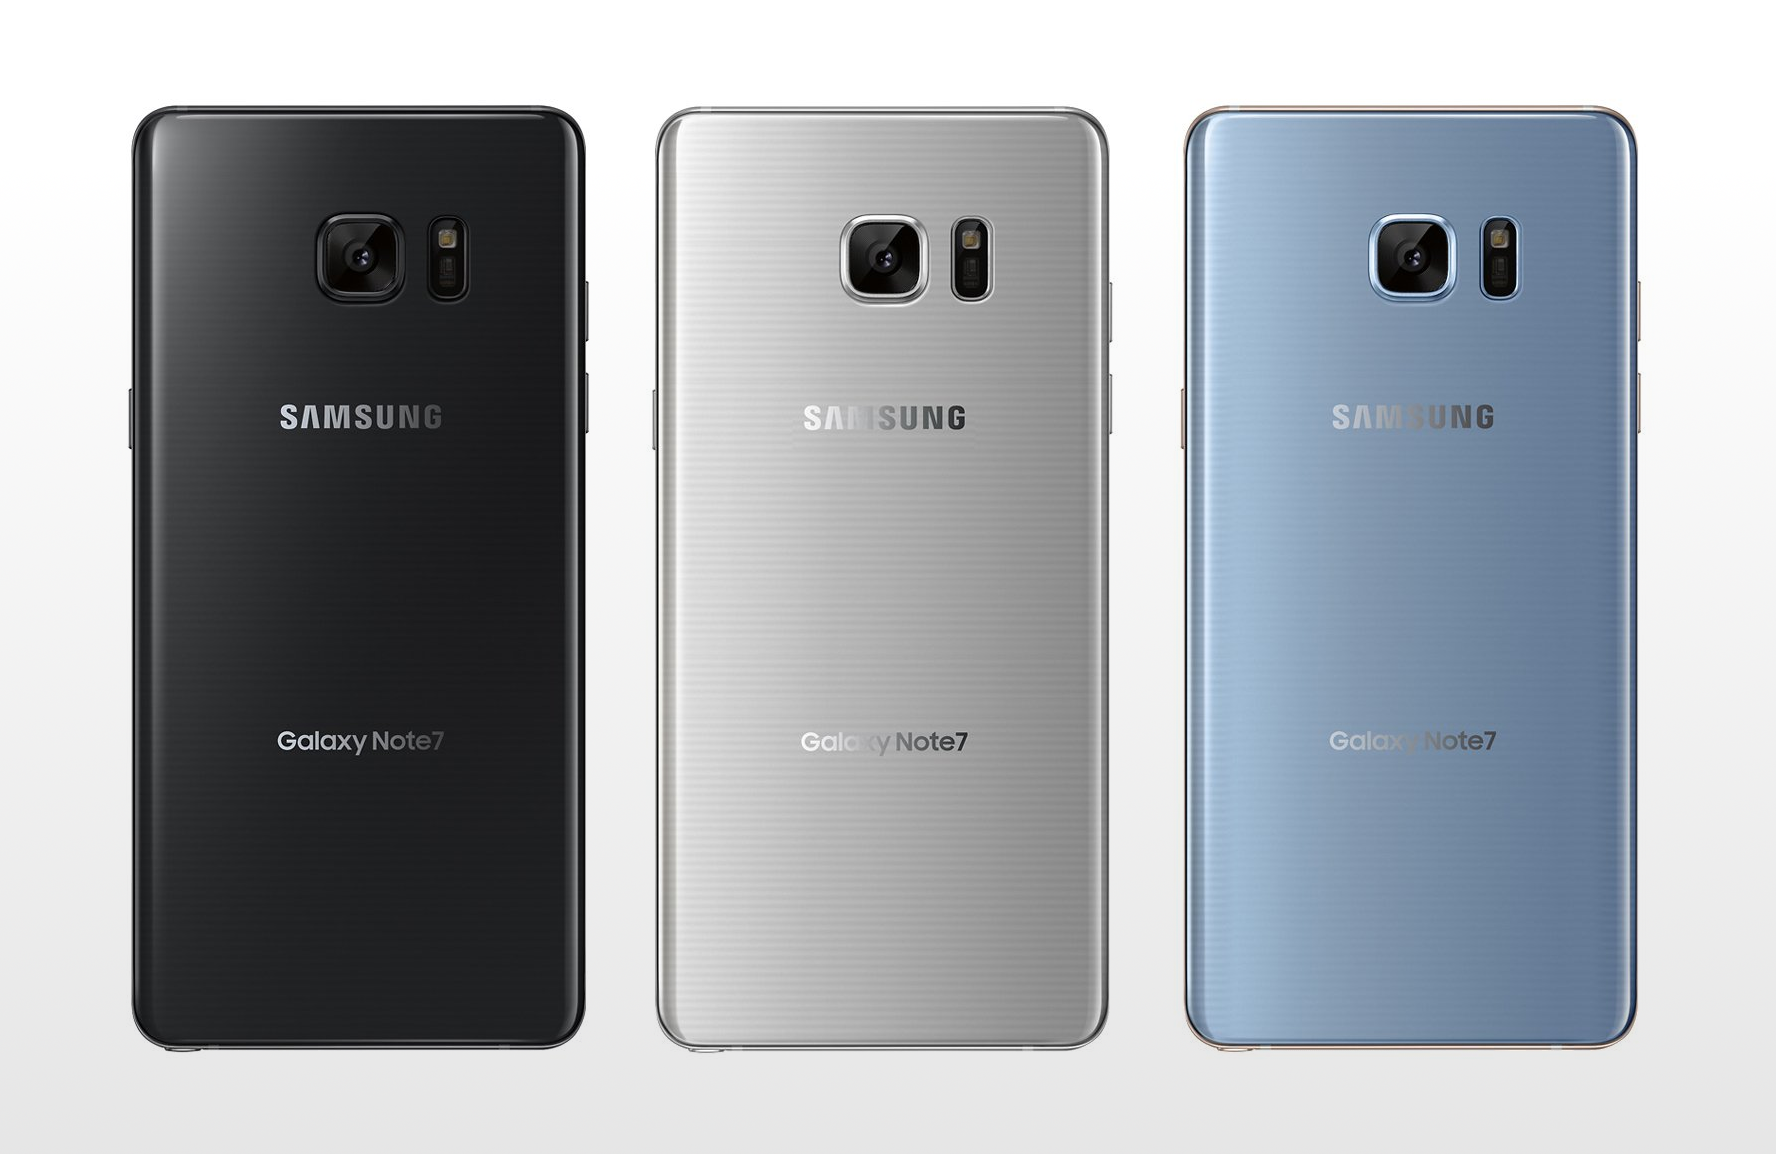 Samsung a incercat, se pare, sa tina ascuns un filmulet cu un Galaxy Note 7 care explodeaza